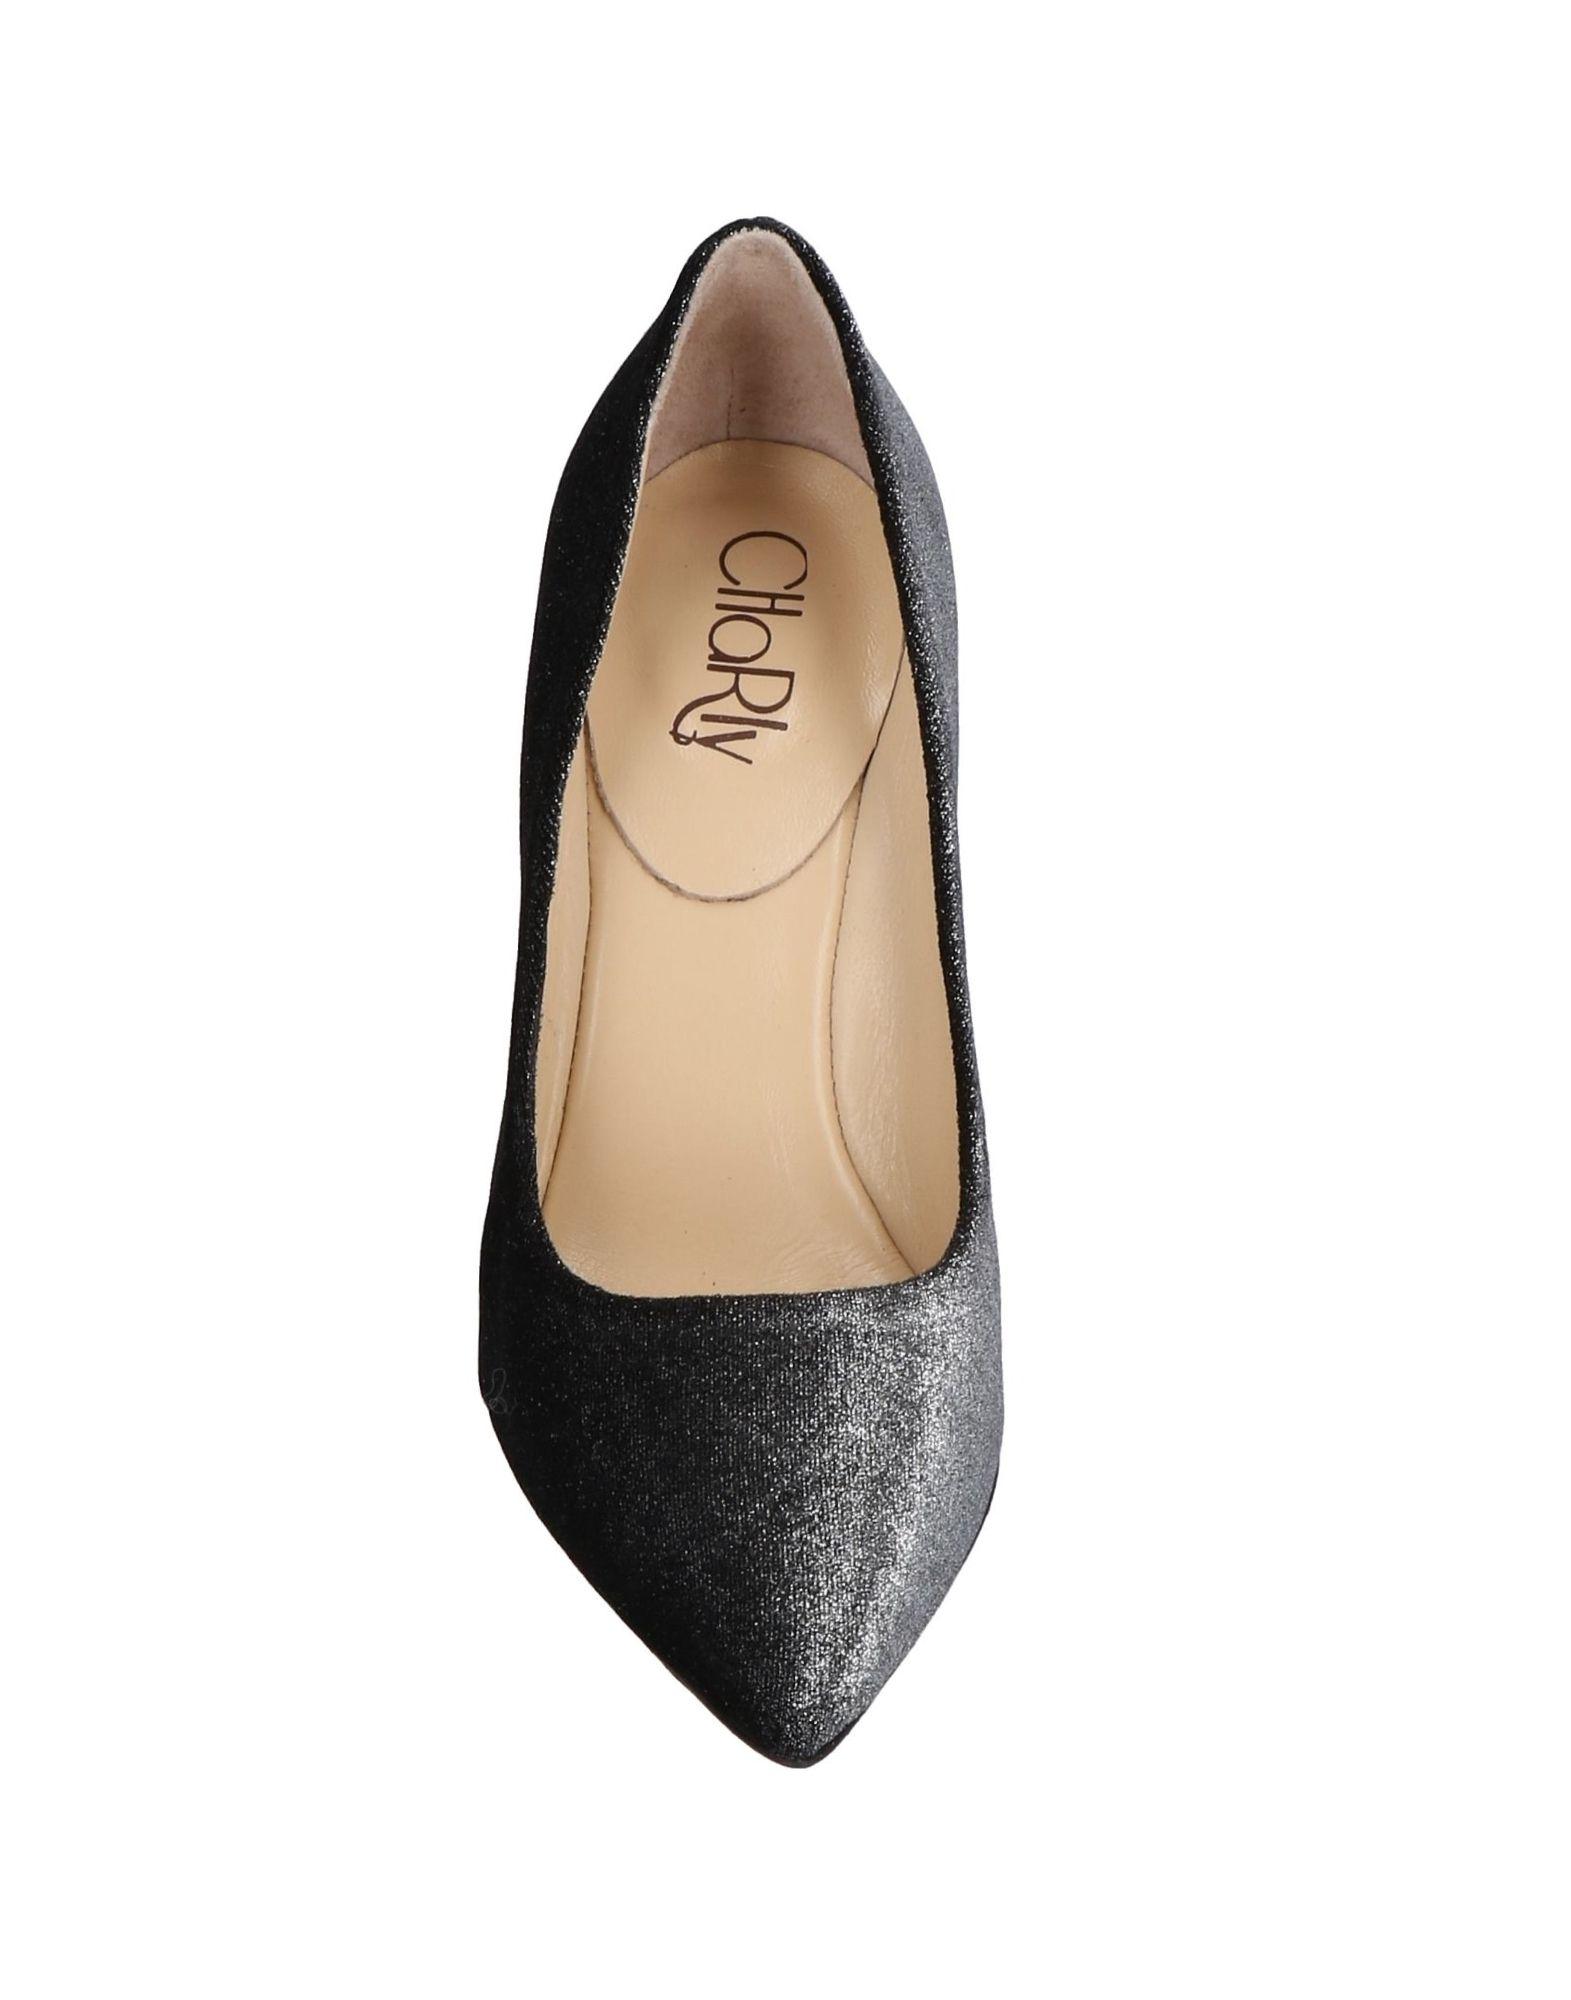 Charly Pumps Damen  11278042NN Gute Qualität beliebte Schuhe